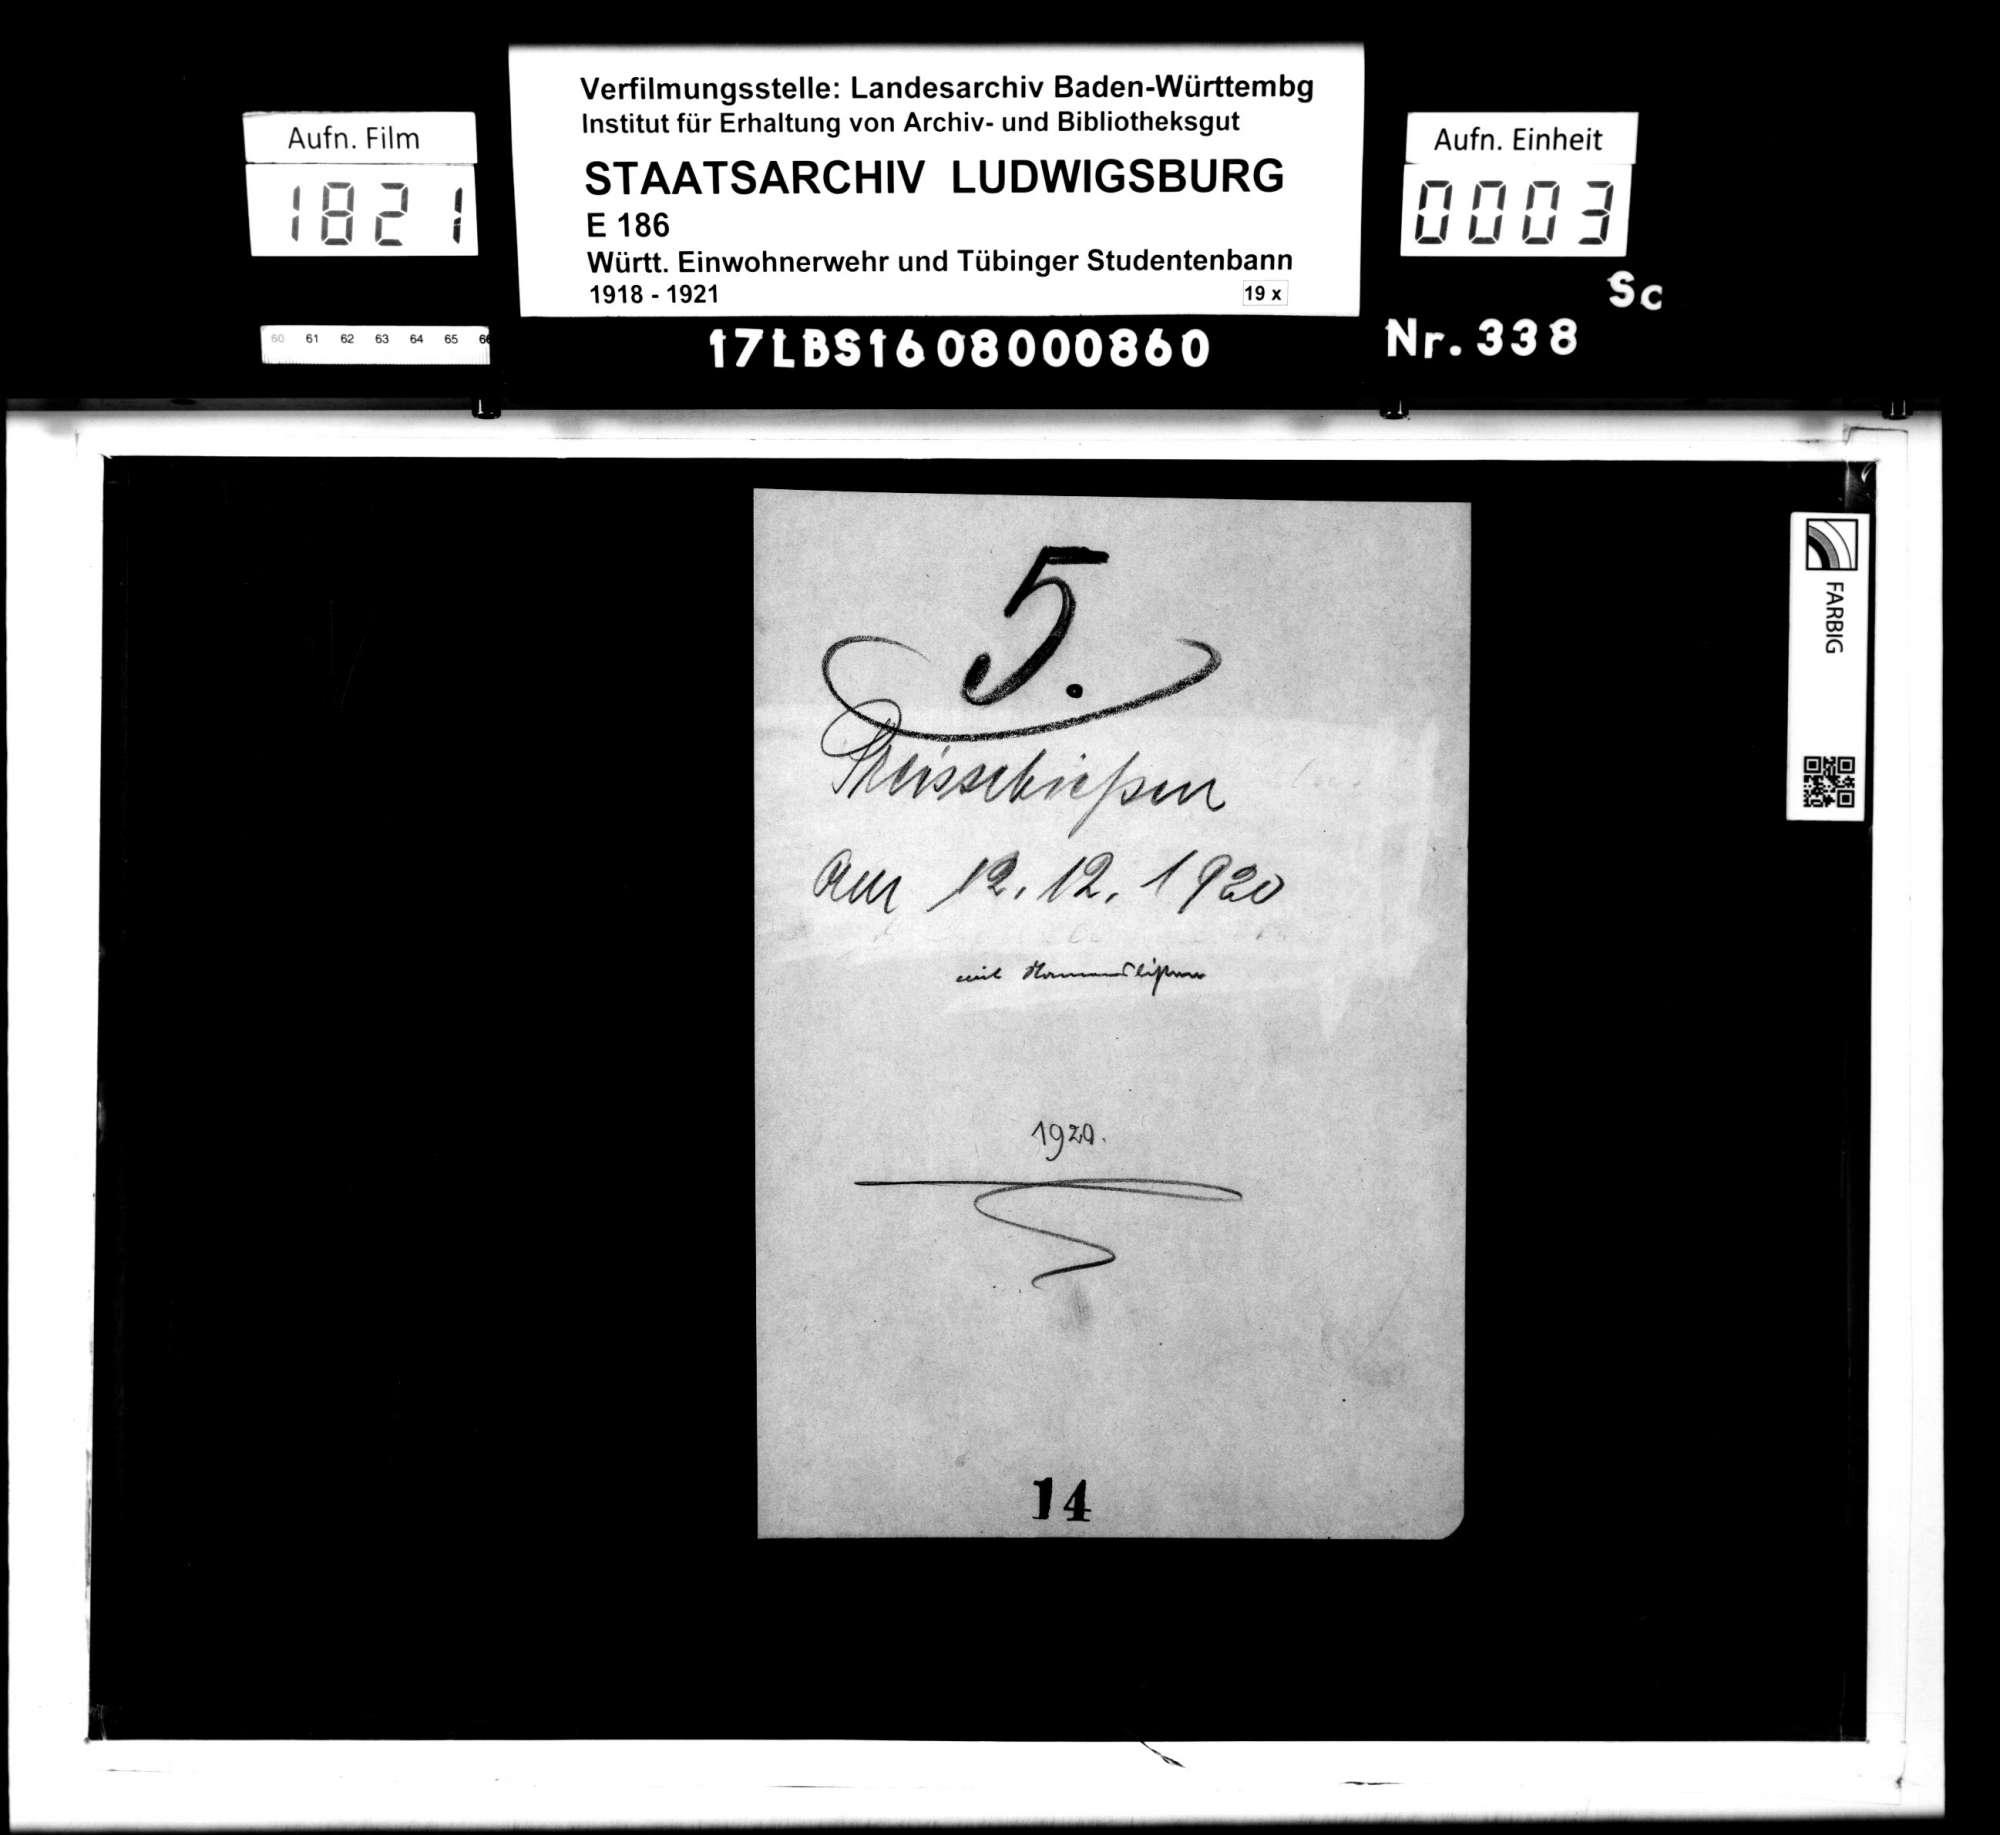 Preisschießen am 12.12.1920: Namenslisten, Bild 1